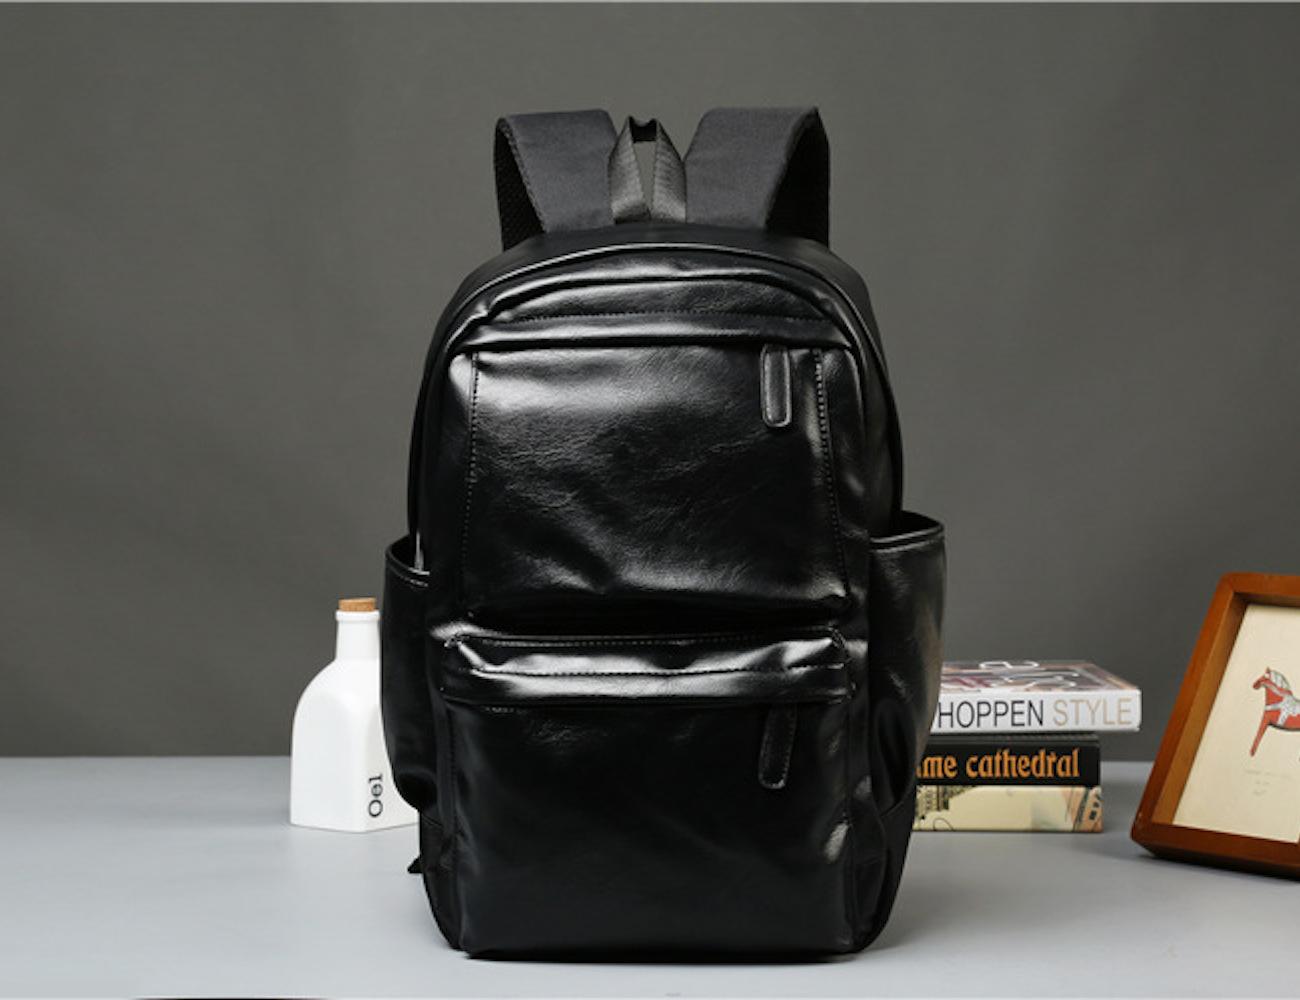 Fashion-Friendly Men's Backpack